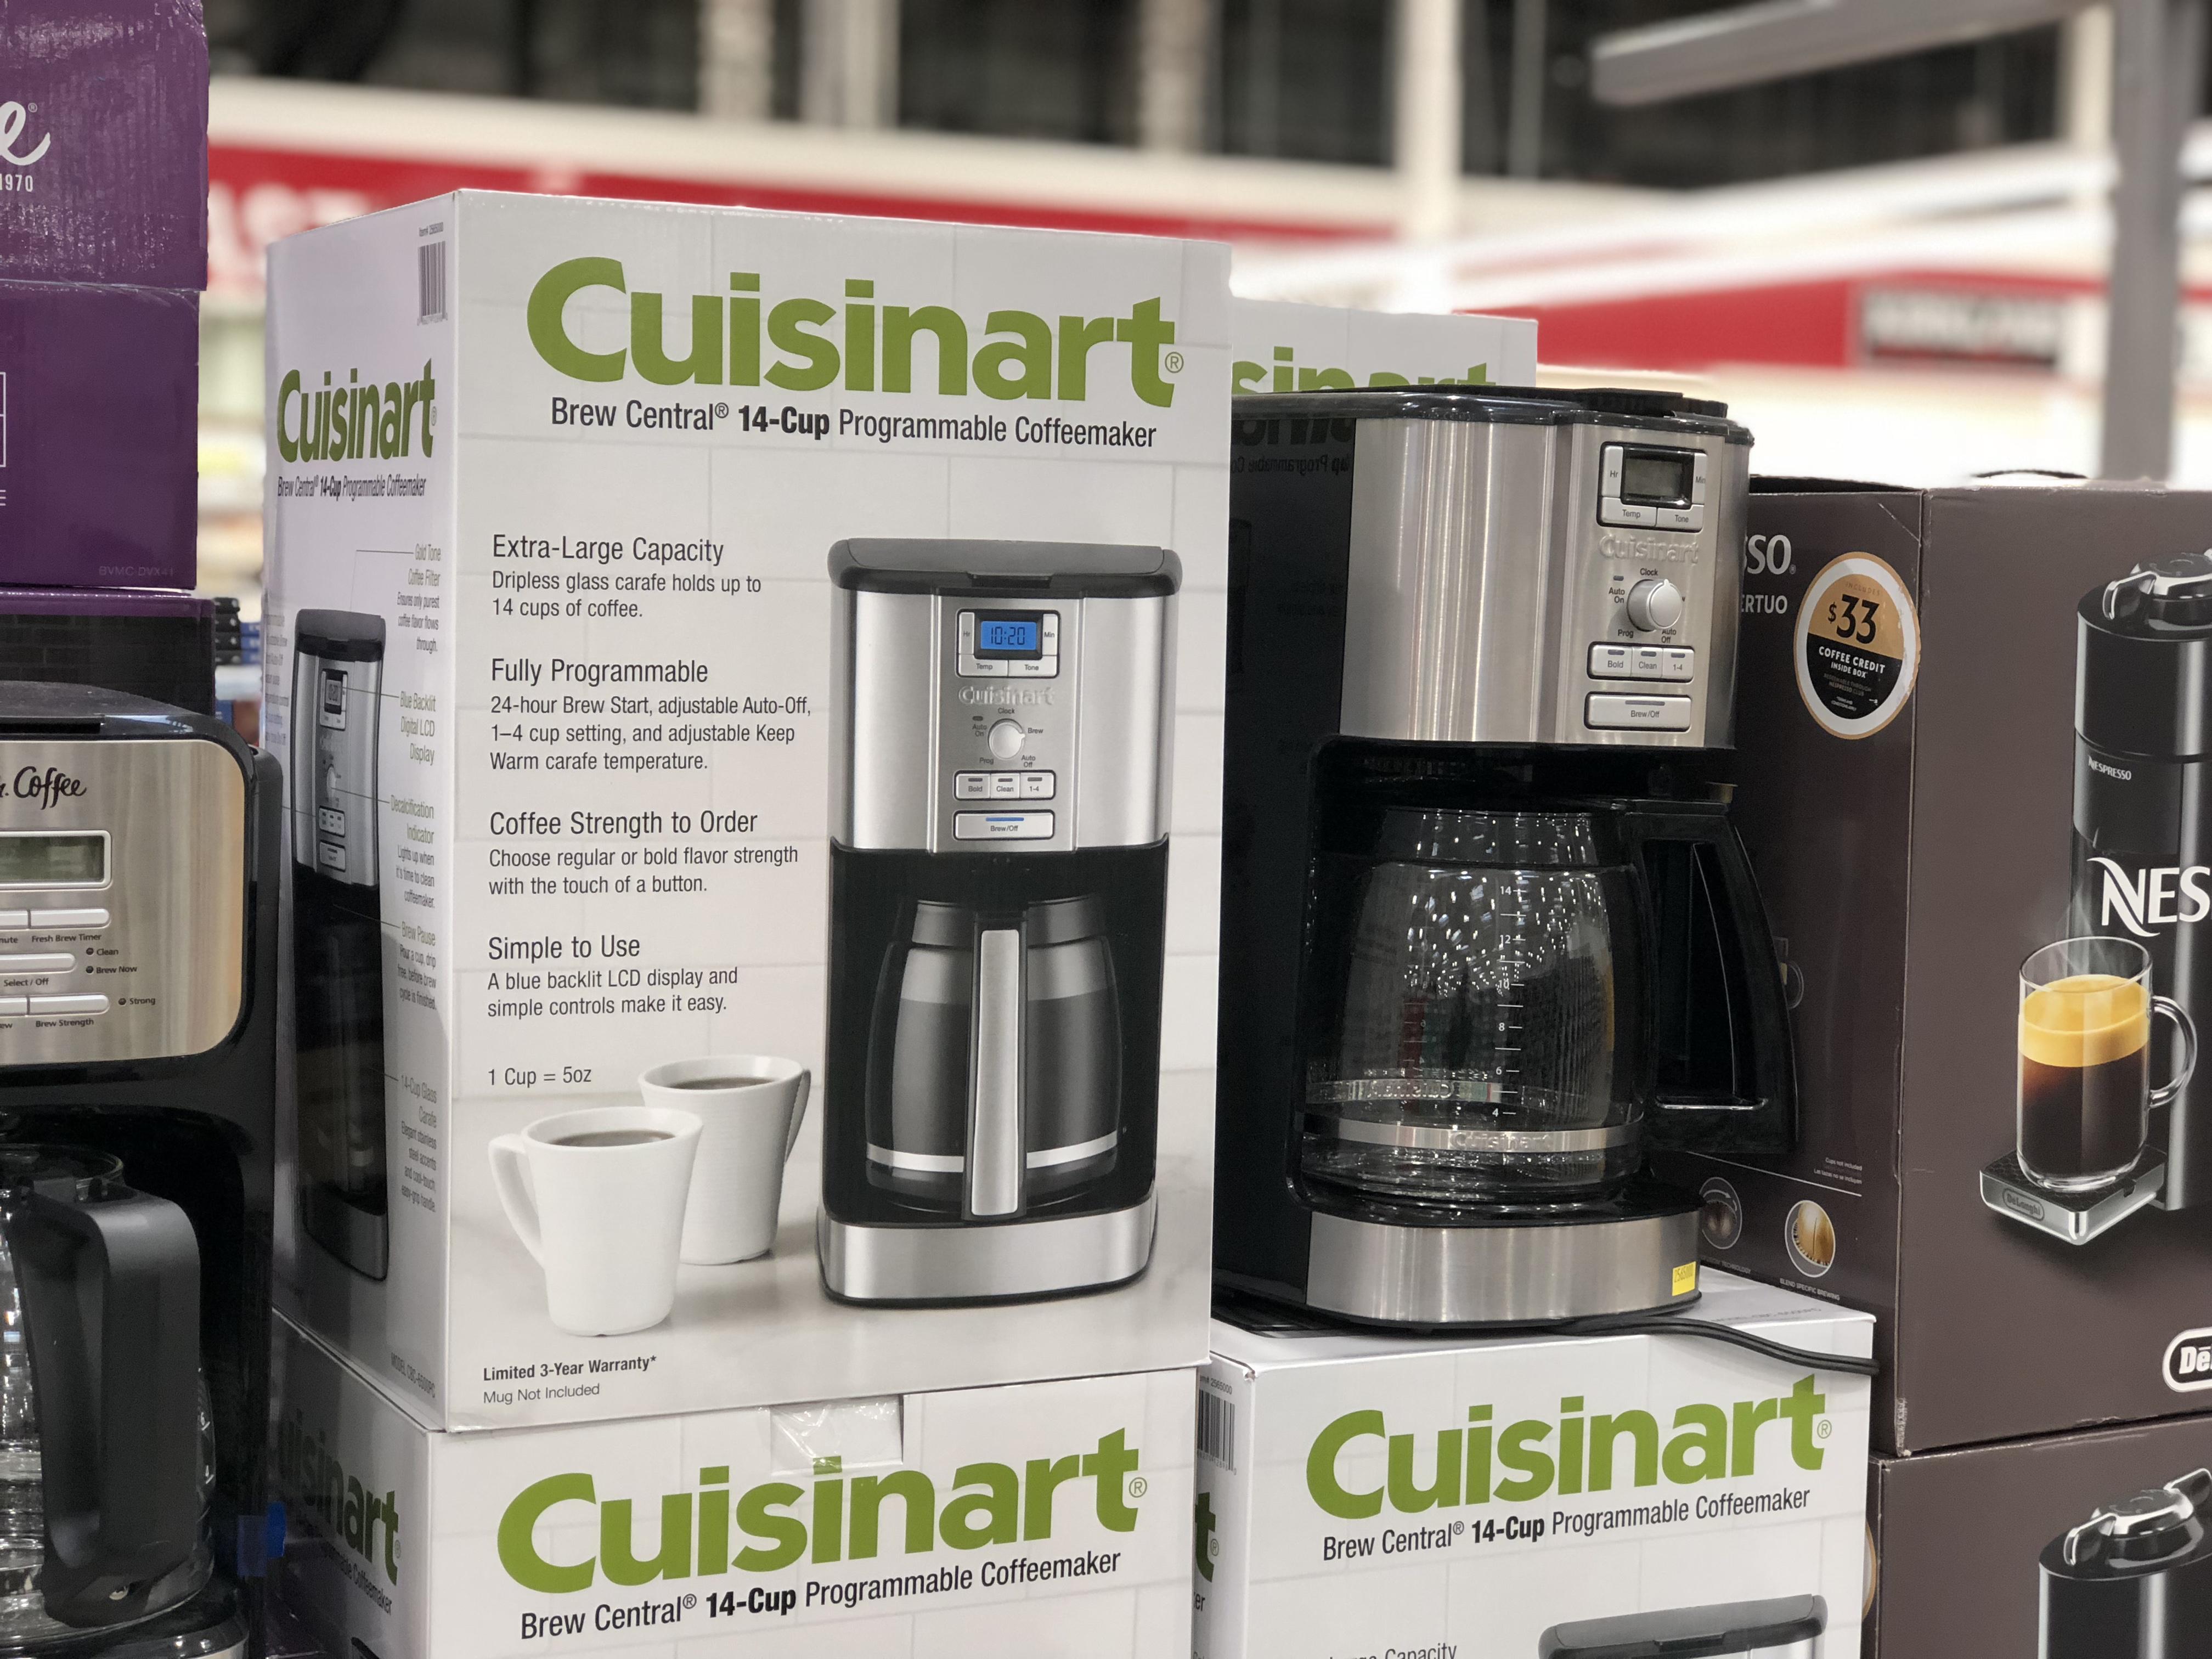 Cuisinart Brew Central coffeemaker at Costco